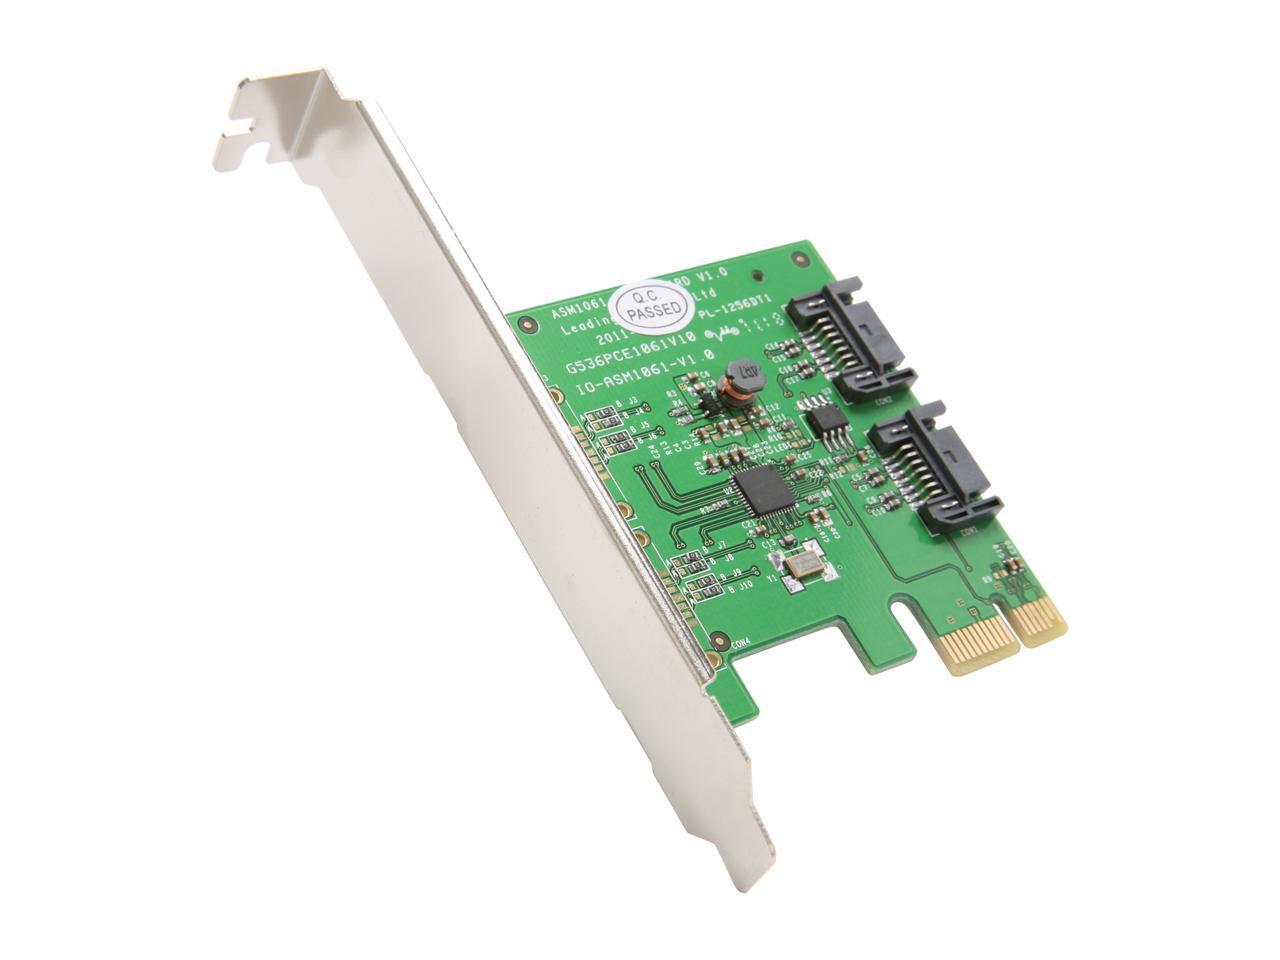 Syba 2x SATA III 6.0Gb/s PCI-e 2.0 Controller Card $1.99 AR + Free Shipping via Newegg